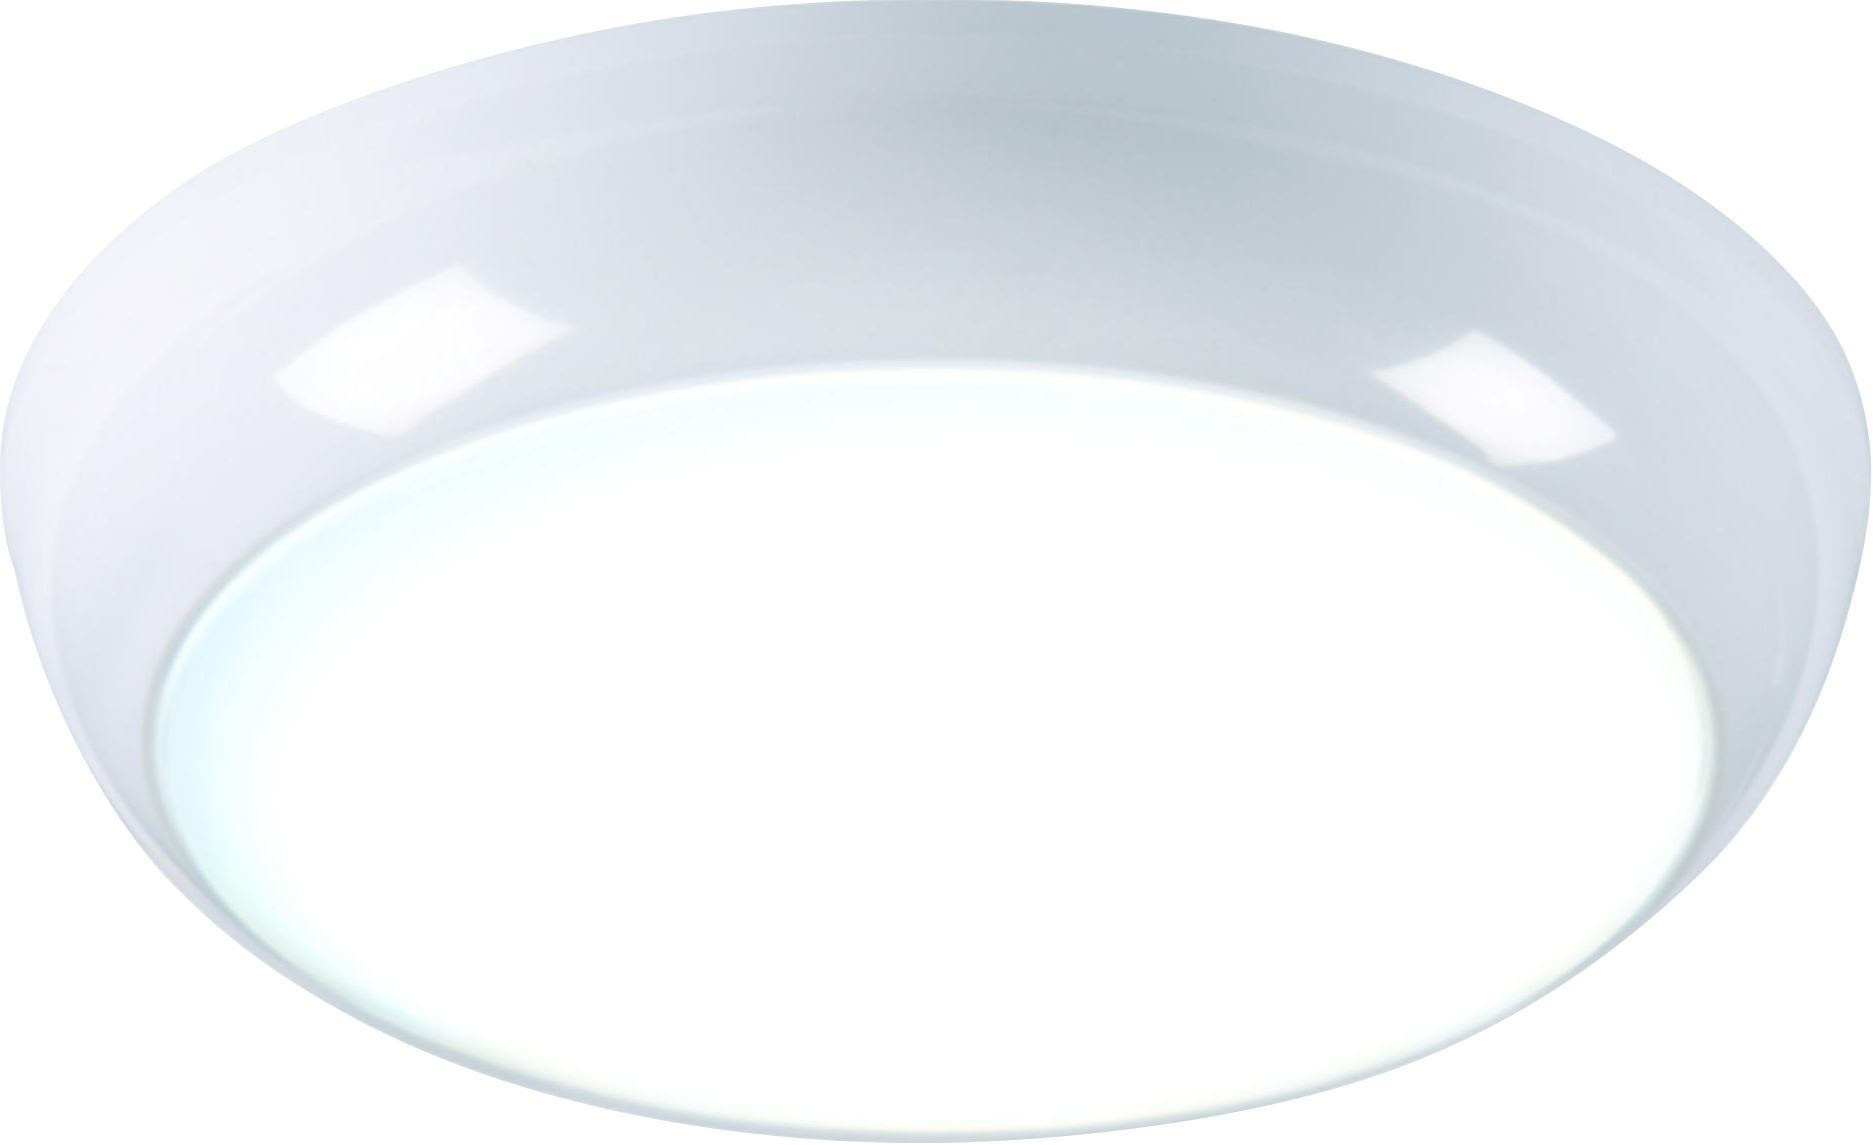 230V IP44 14W LED Emergency Bulkhead Fitting with Sensor 6000K